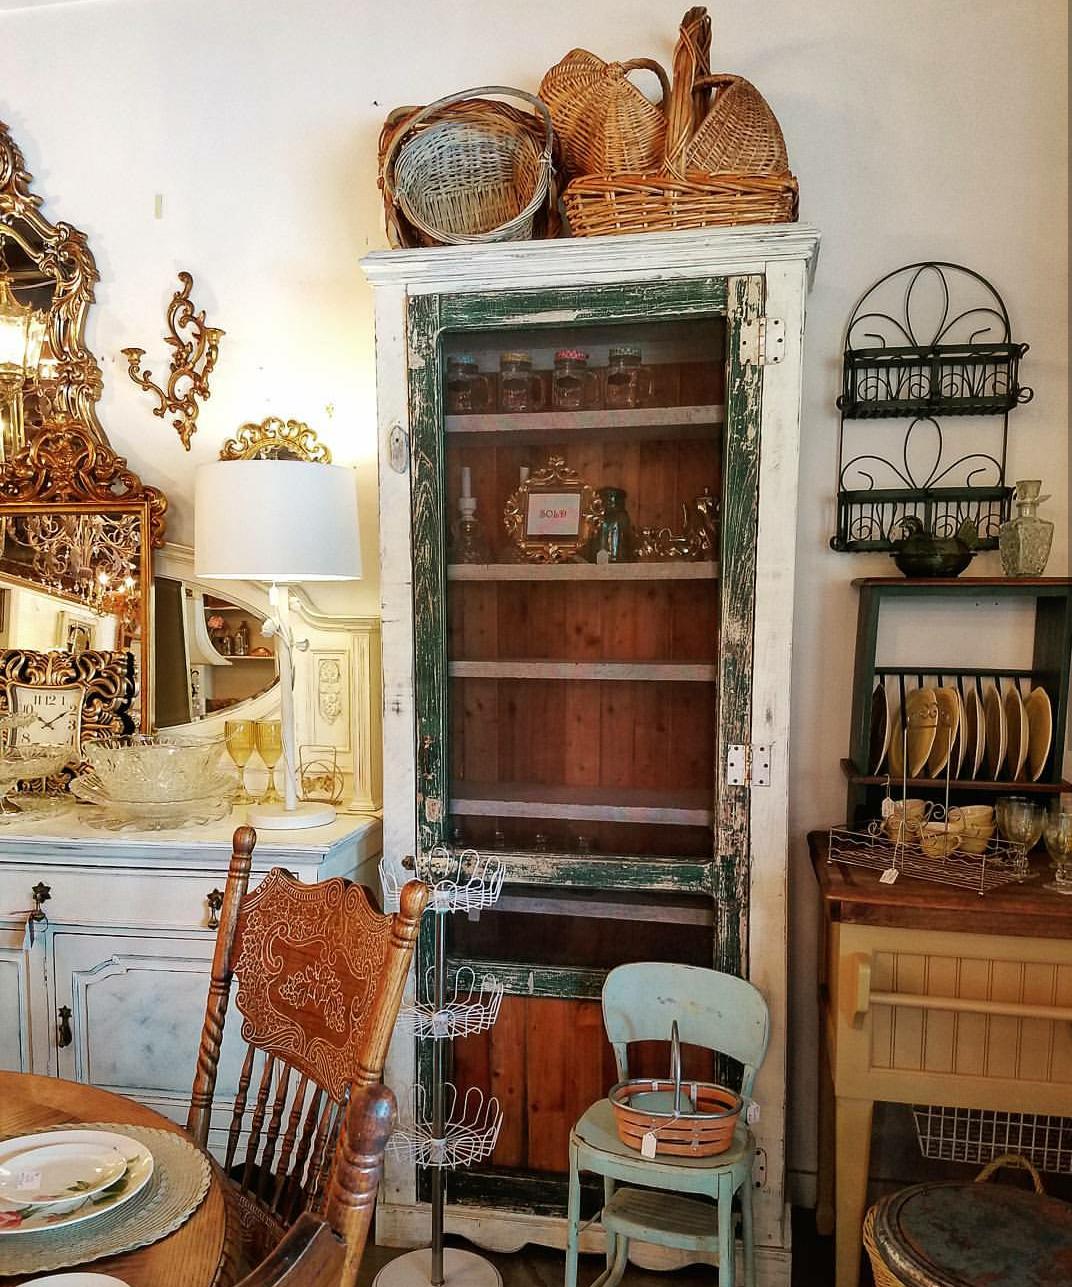 antiques store vintage store pressed back chair vintage basket vintage dishes